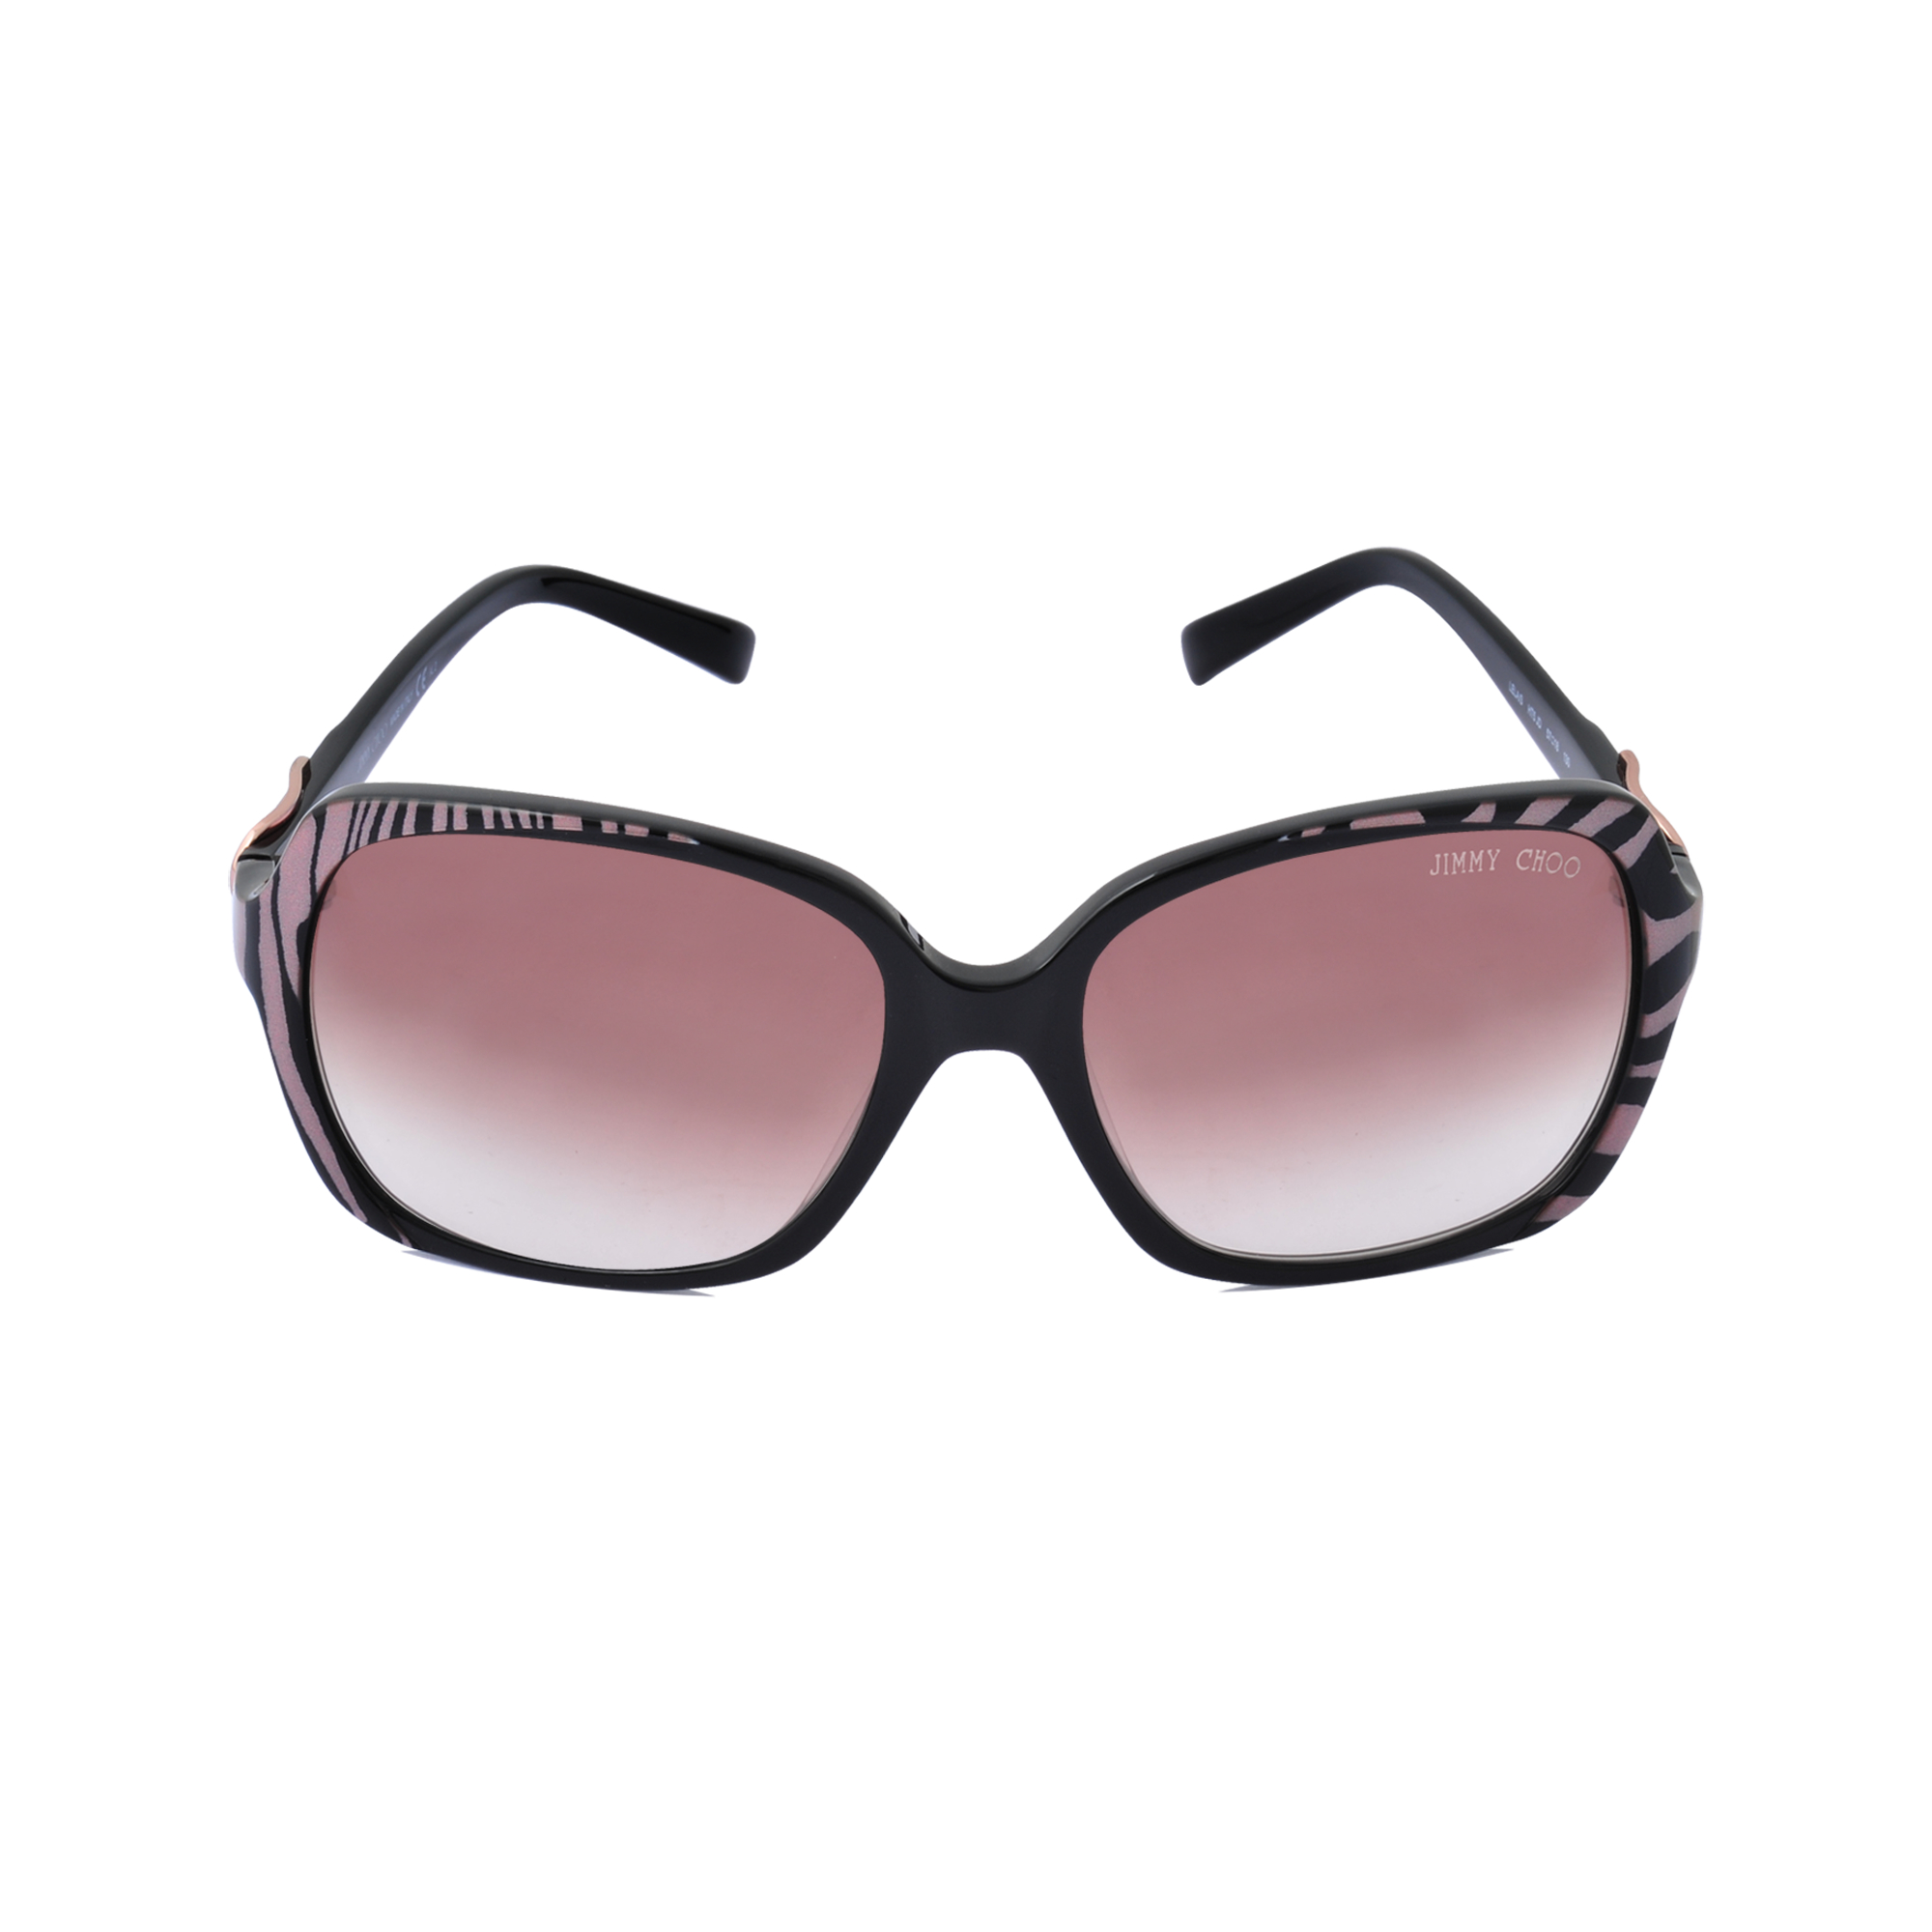 Jimmy Choo Eyeglass Frames 2015 : jimmy choo eyewear collection 2015 de miu miu Simply ...